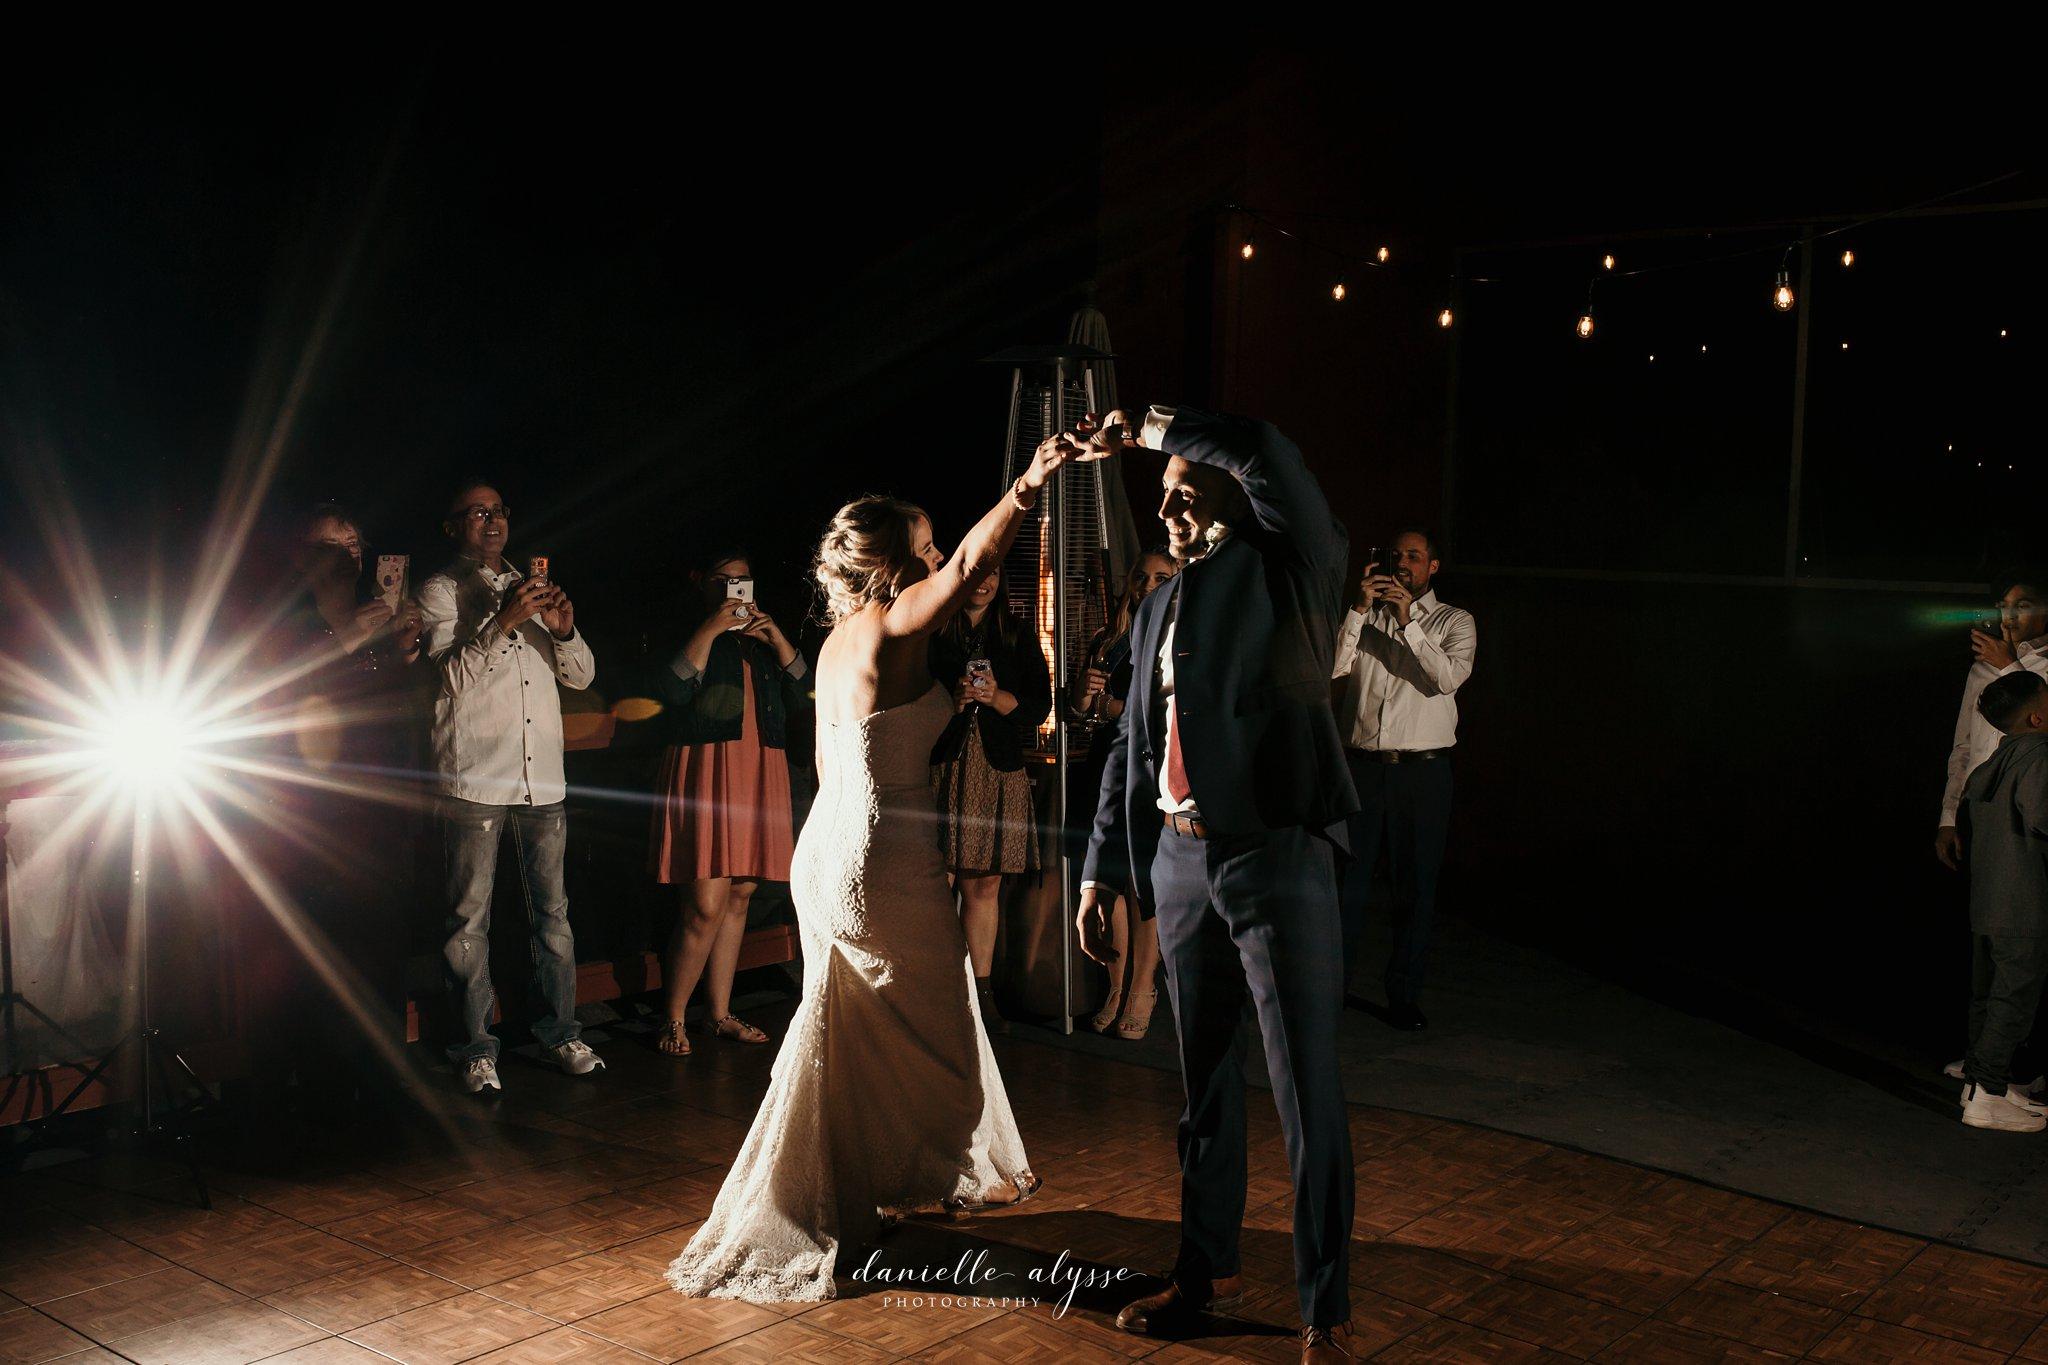 180831_wedding_stephanie_heavenly_south_lake_tahoe_danielle_alysse_photography_destination_blog_1170_WEB.jpg